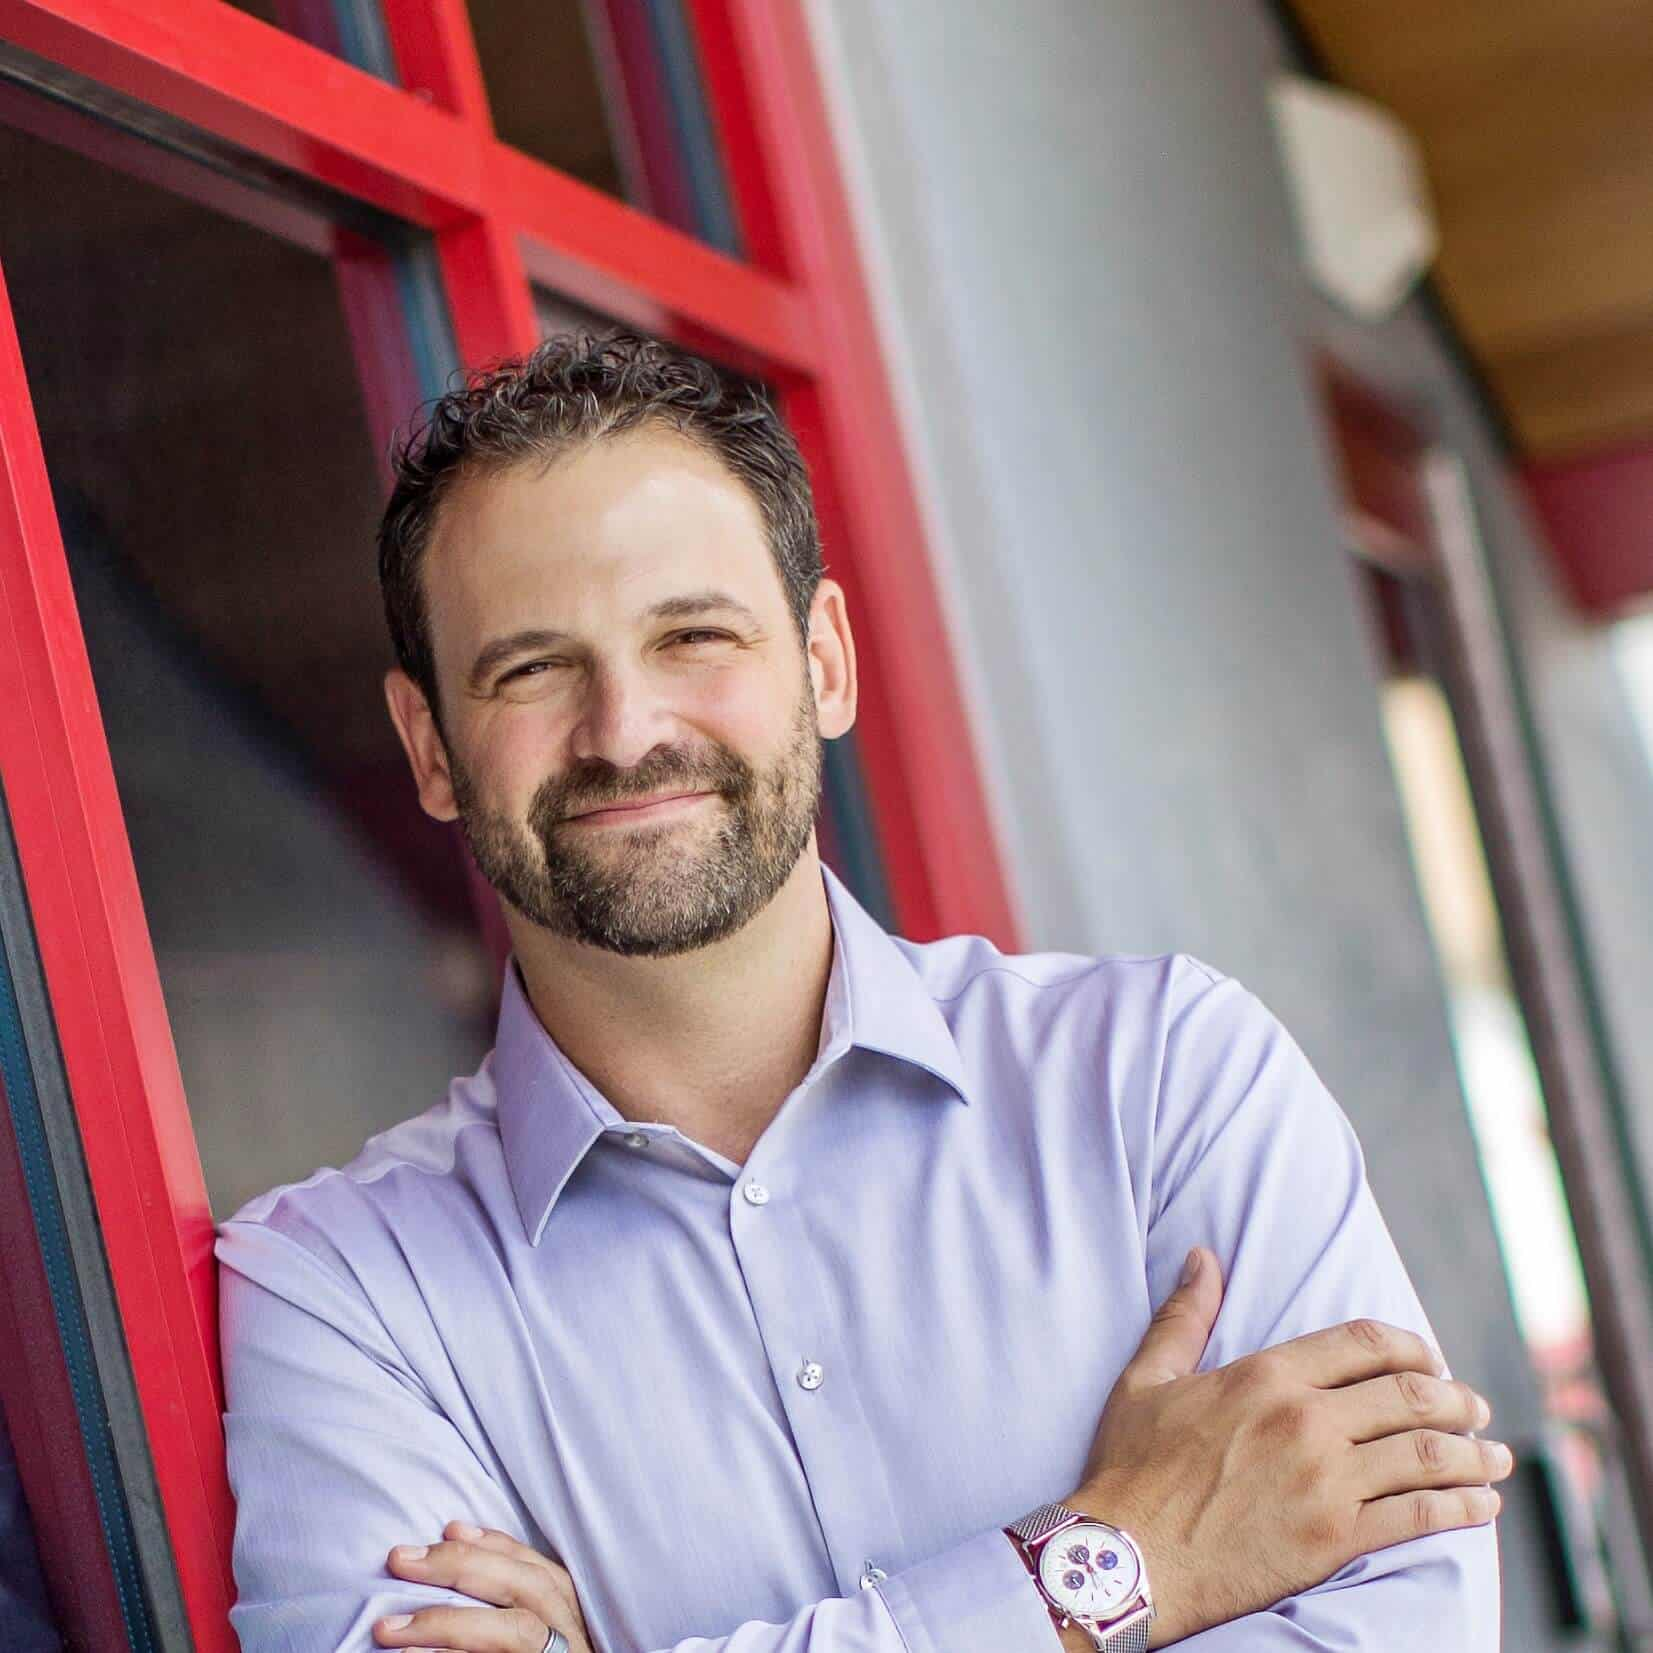 Jason Rappaport